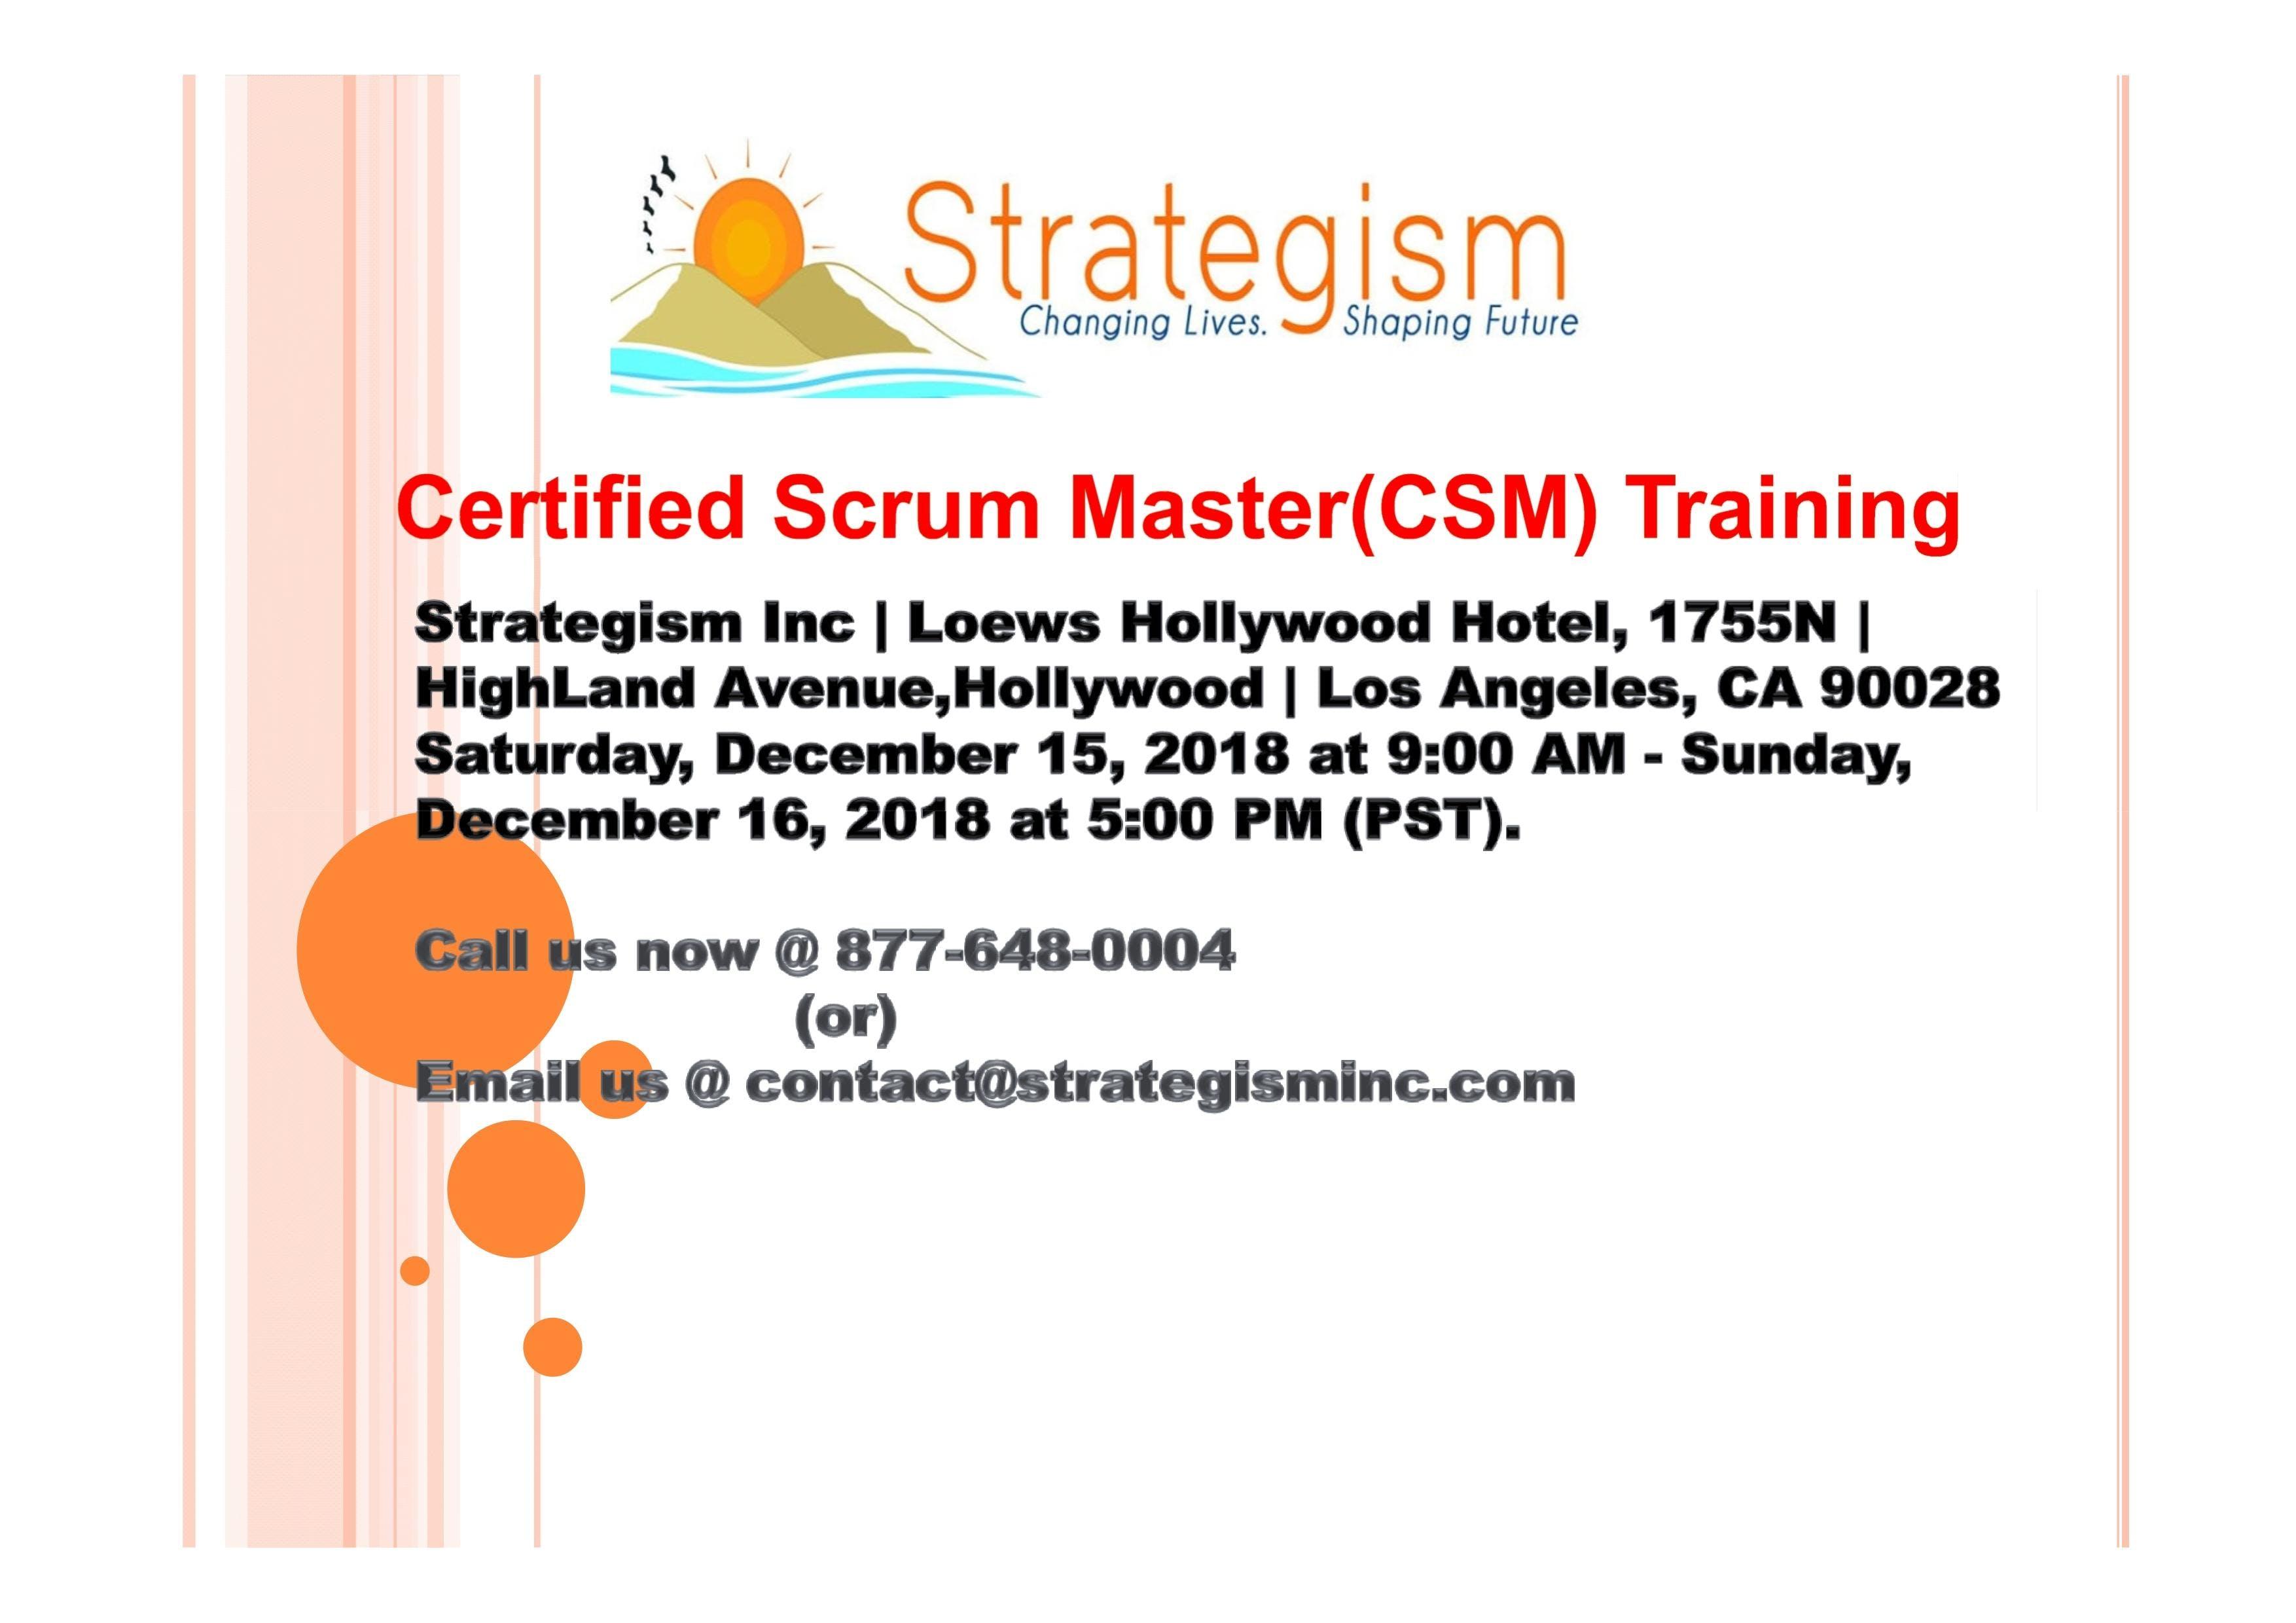 Certified Scrum Master Csm Training For Pasadena Dec 15162018